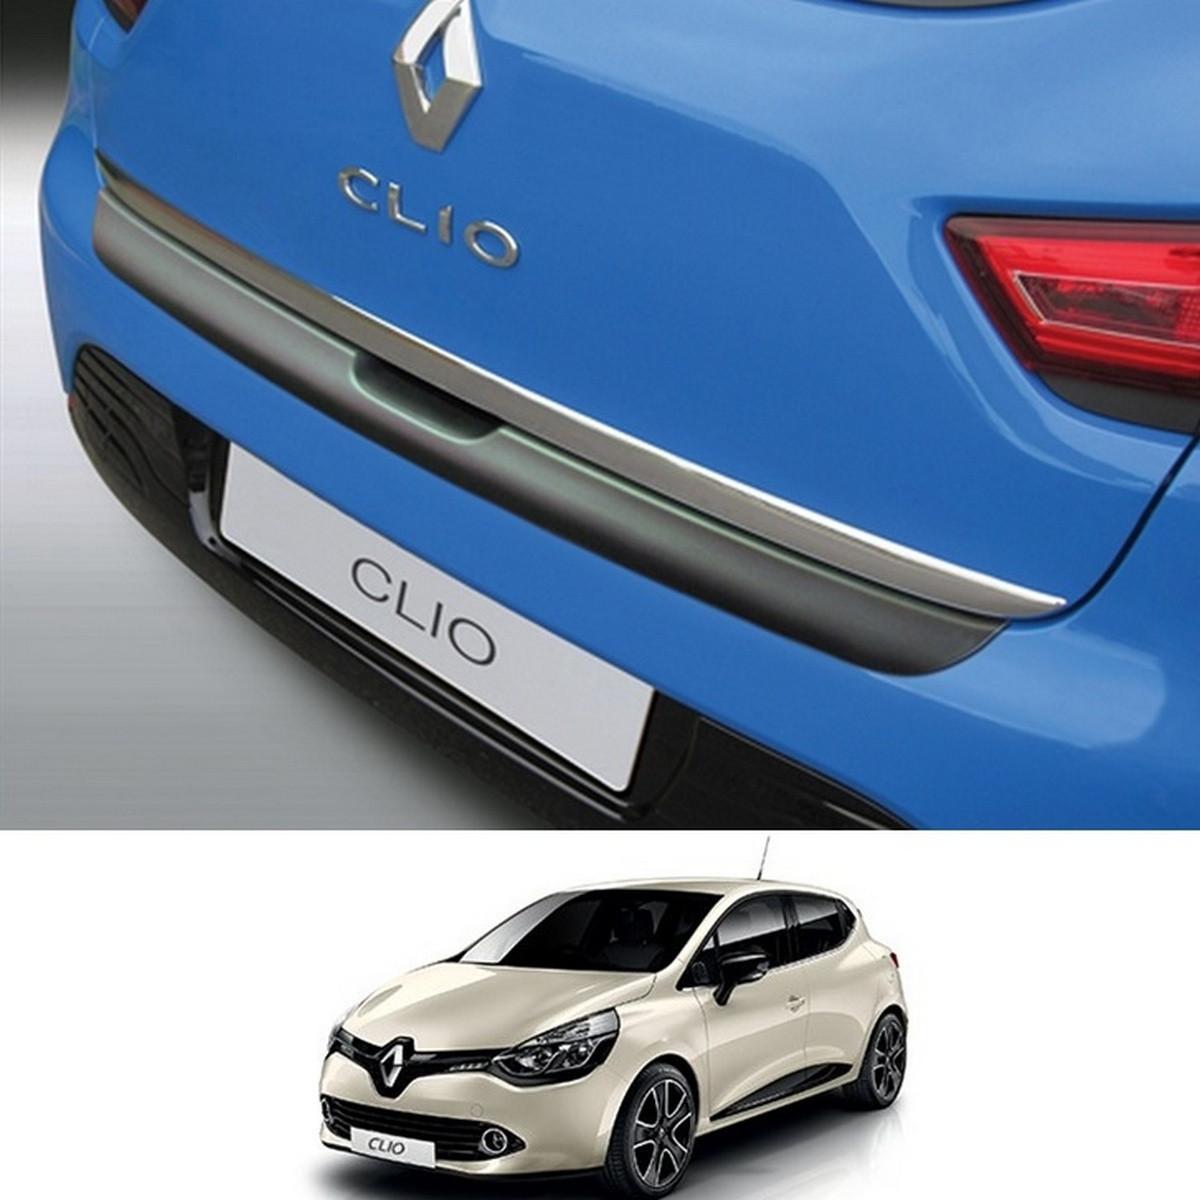 Пластикова захисна накладка на задній бампер для Renault Clio lV 2012-2019